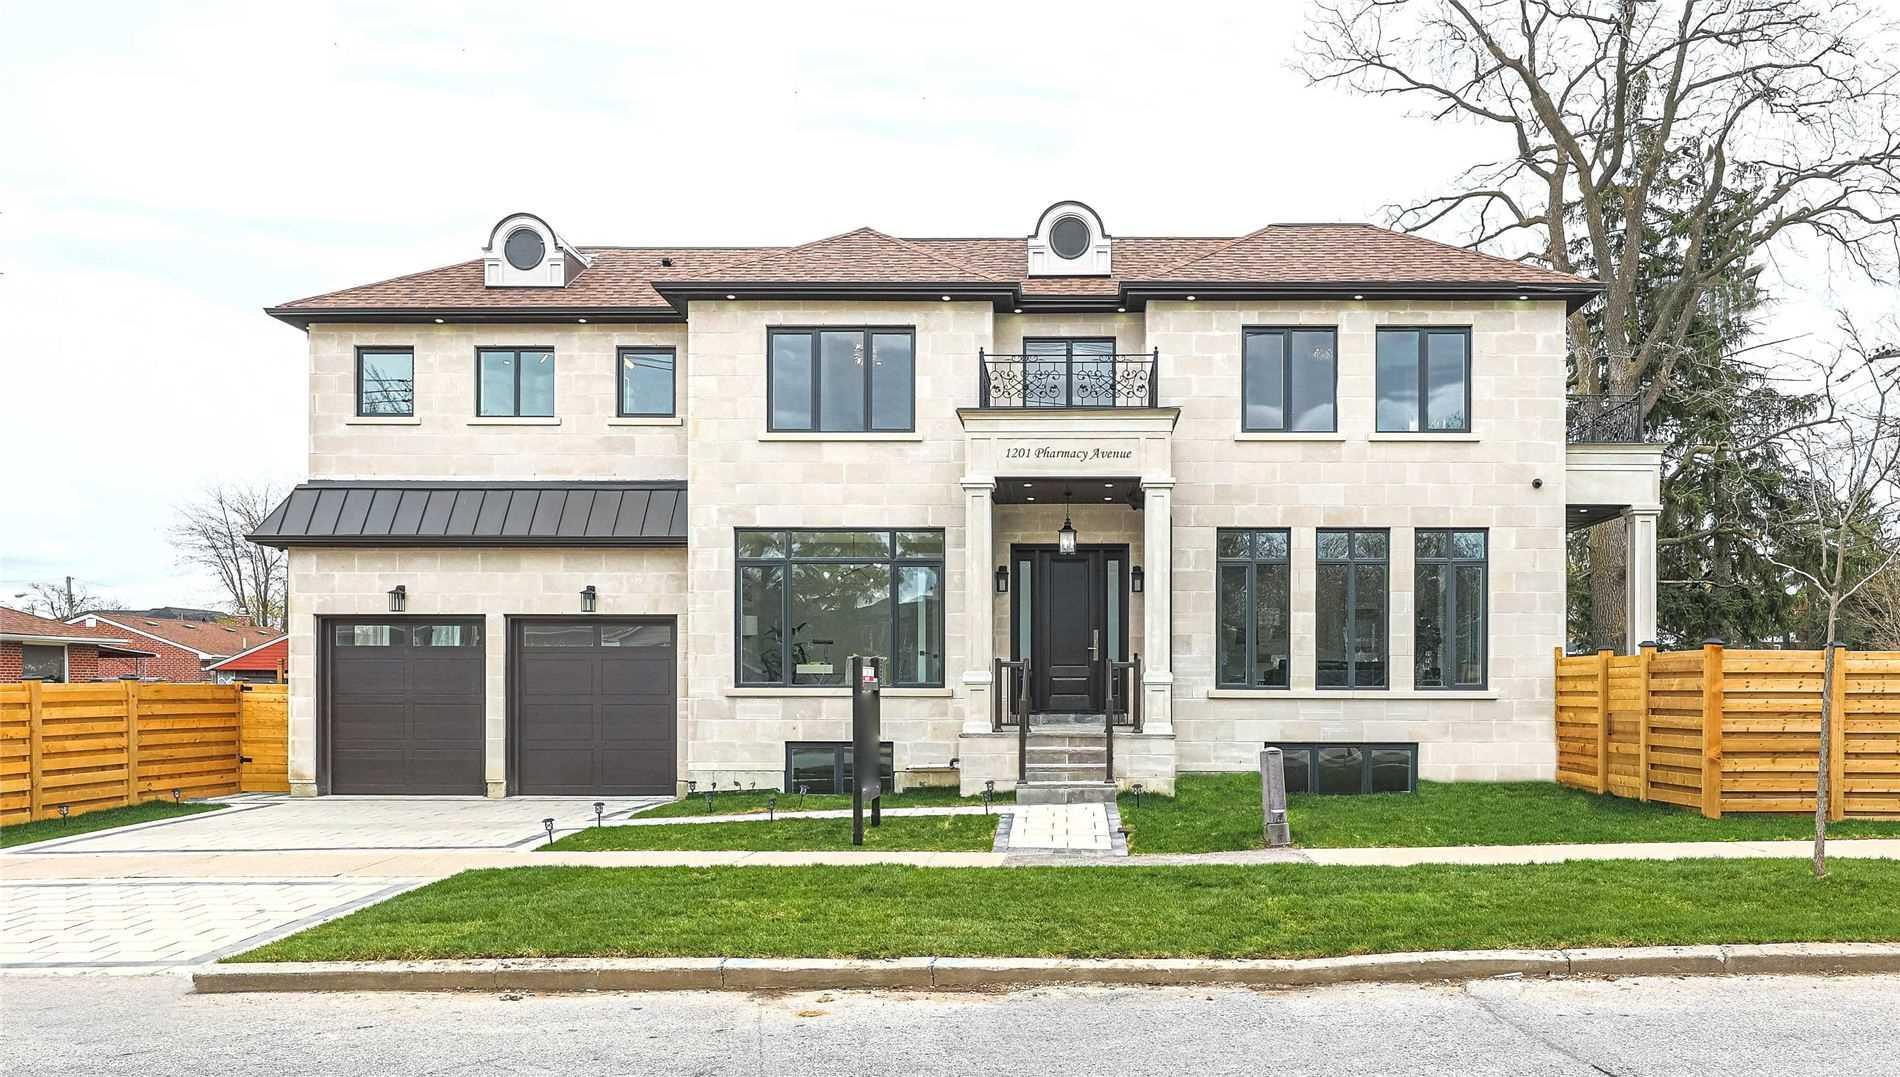 1201 Pharmacy Ave, Toronto, Ontario M1R2H5, 4 Bedrooms Bedrooms, 16 Rooms Rooms,6 BathroomsBathrooms,Detached,For Sale,Pharmacy,E5204444